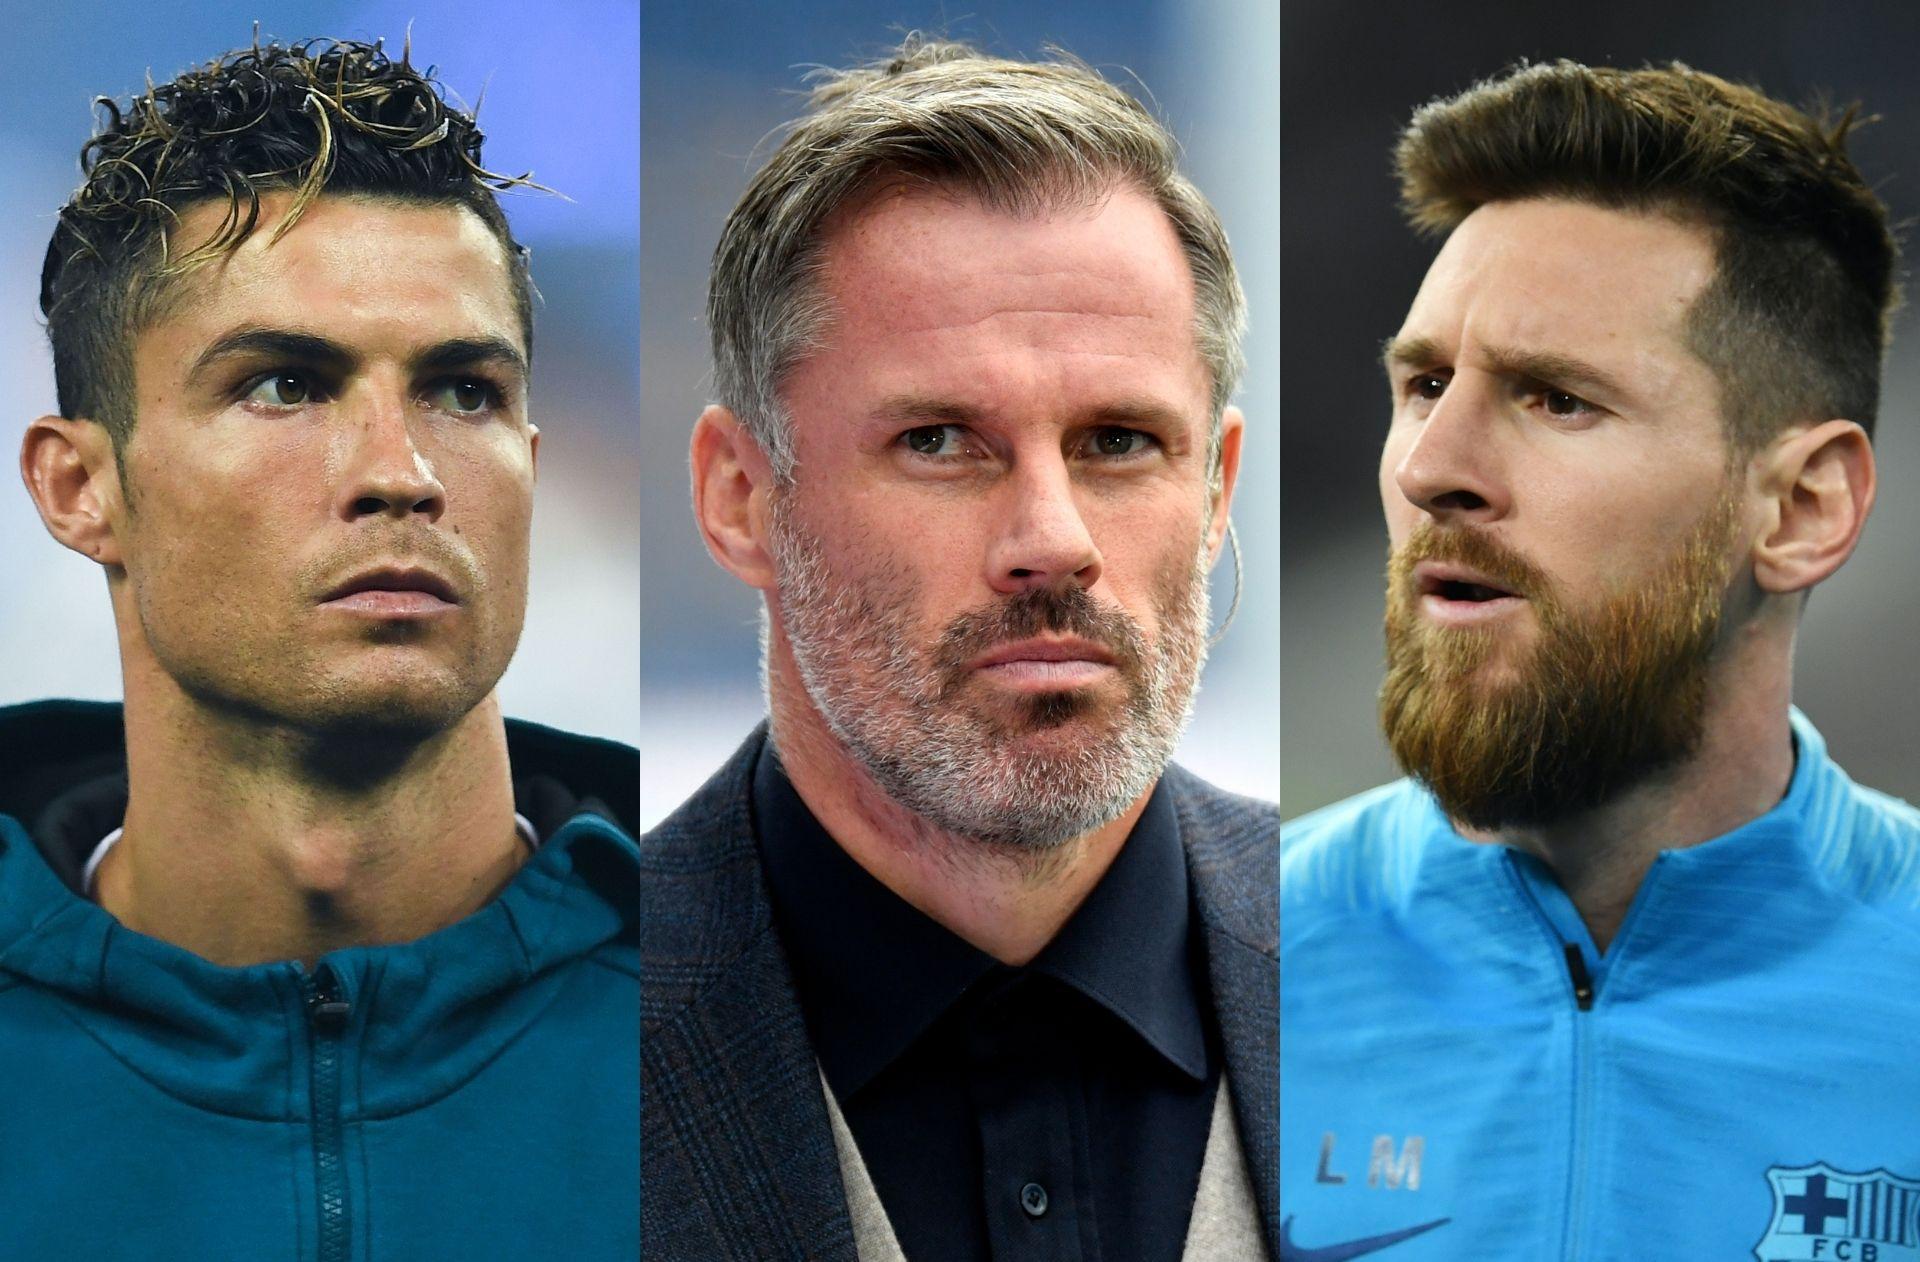 Cristiano Ronaldo, Jamie Carragher, Lionel Messi